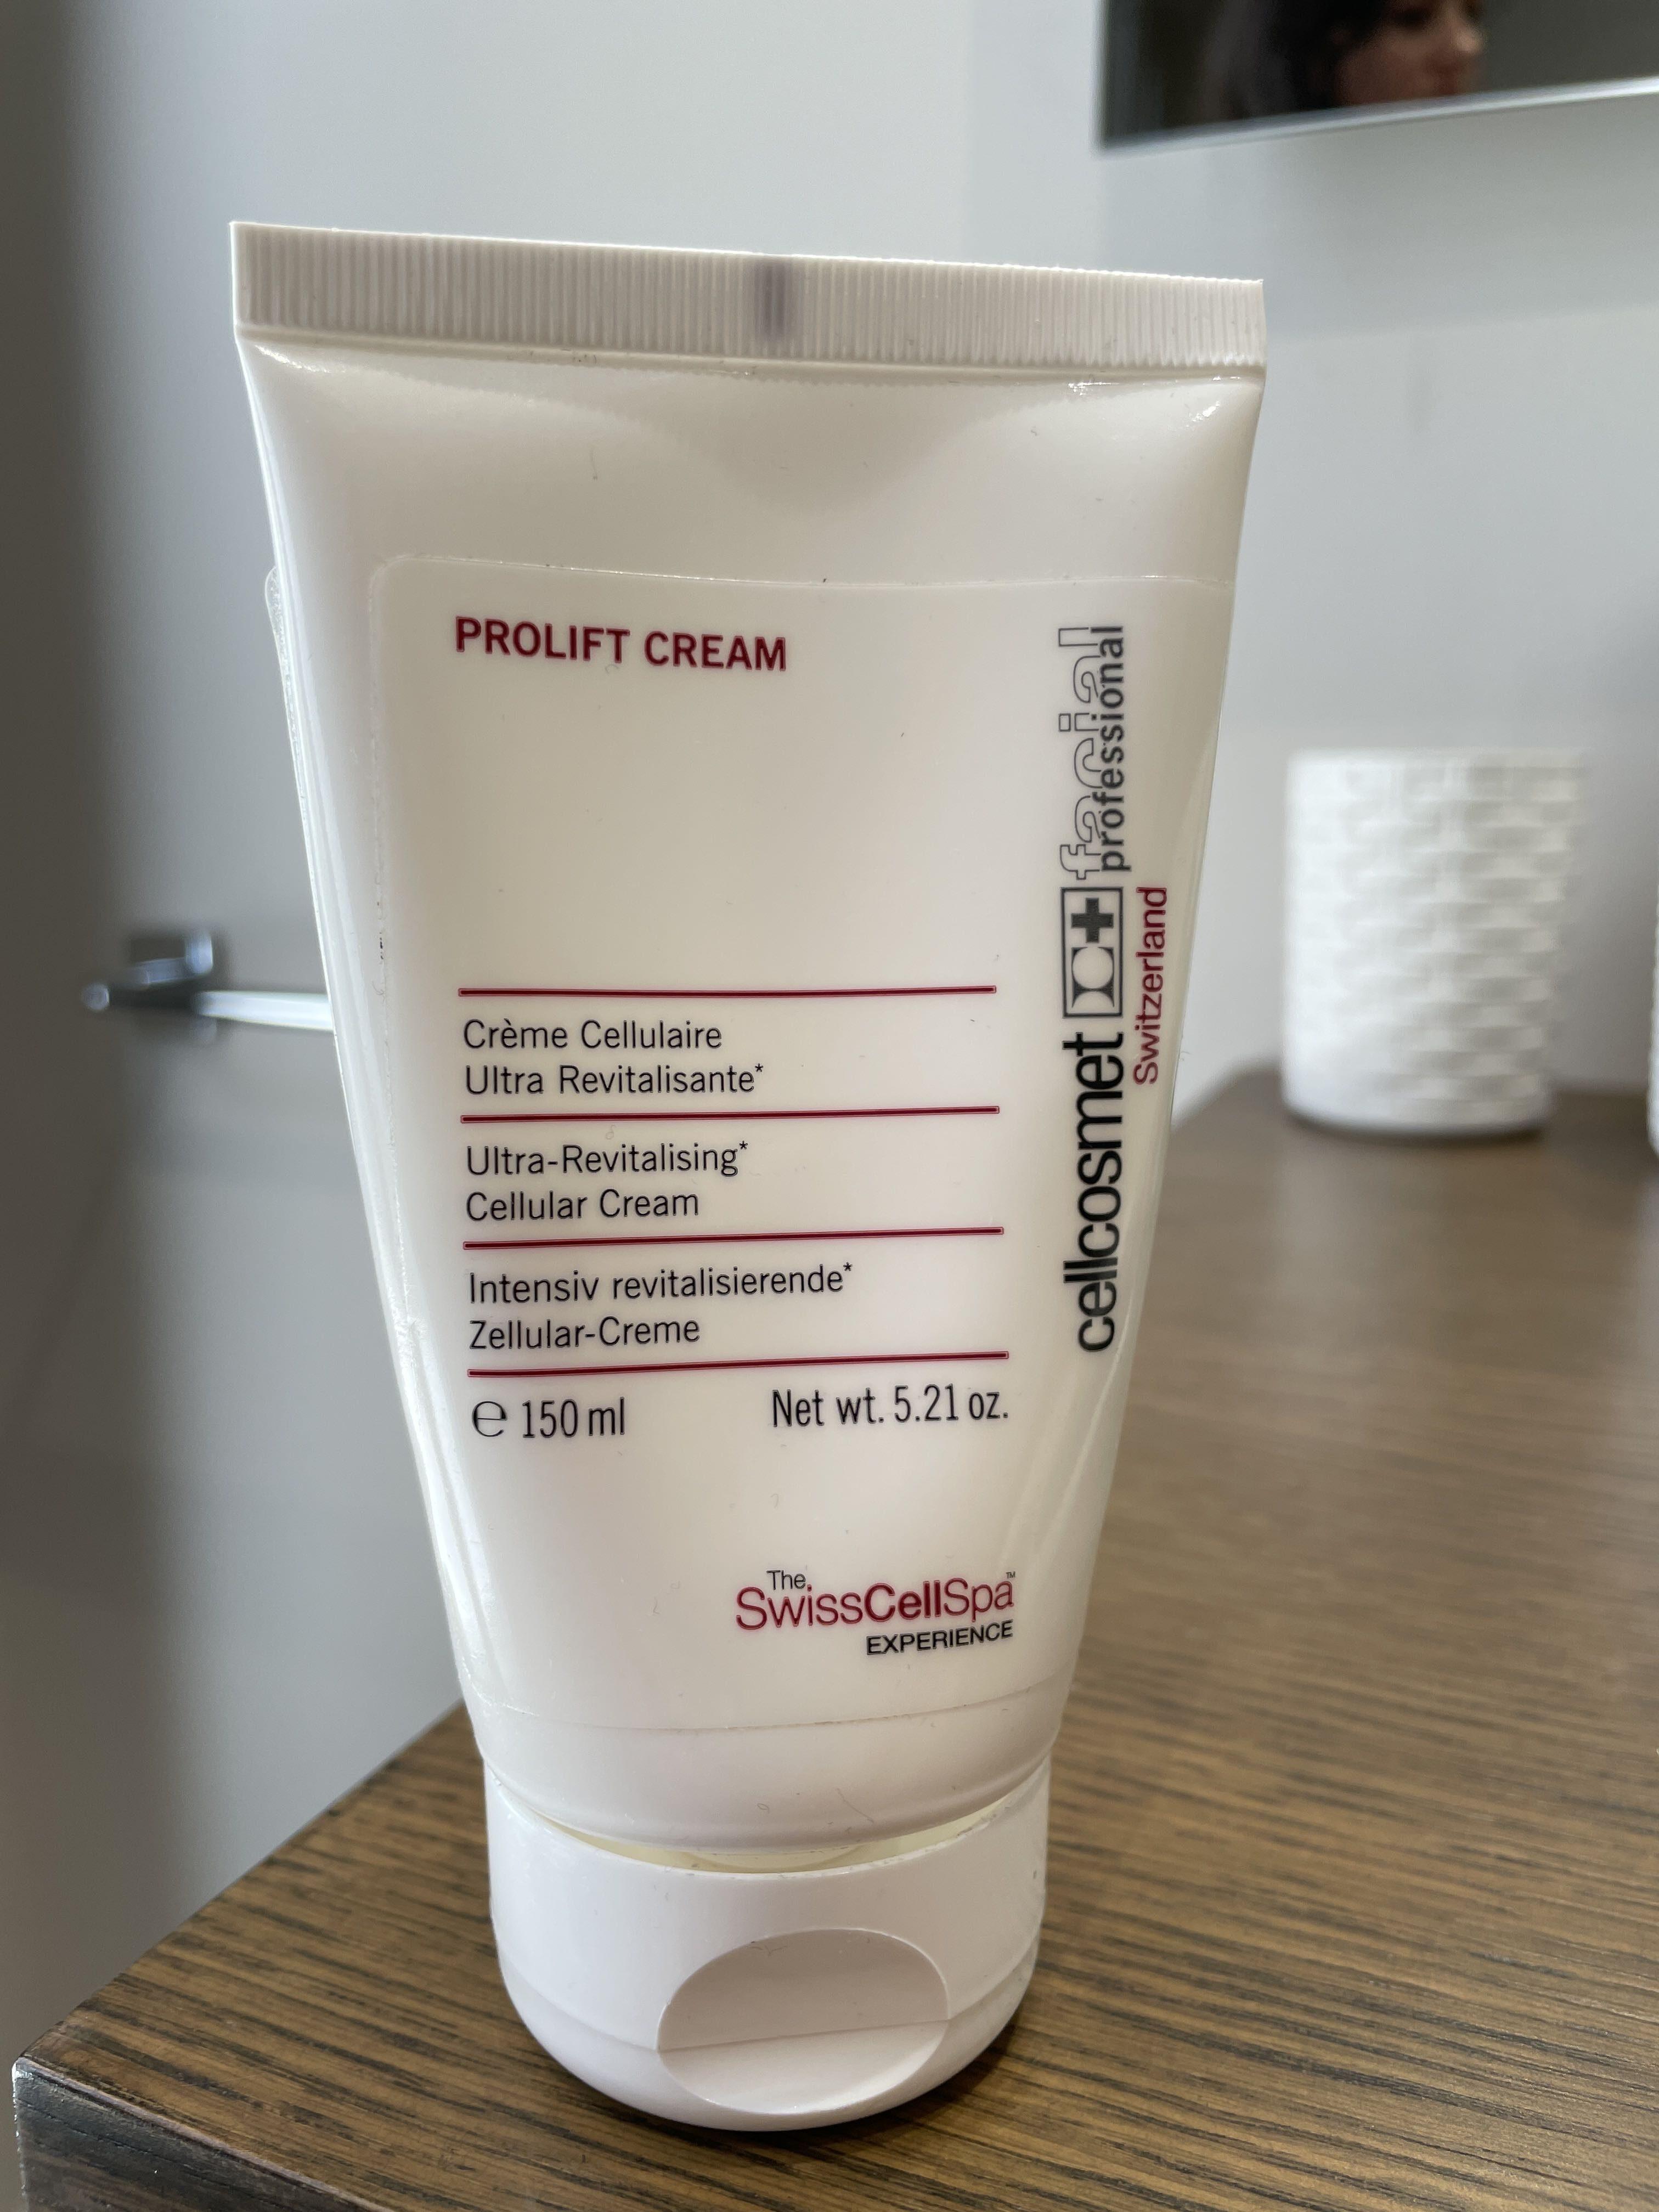 Prolift cream - Product - ru